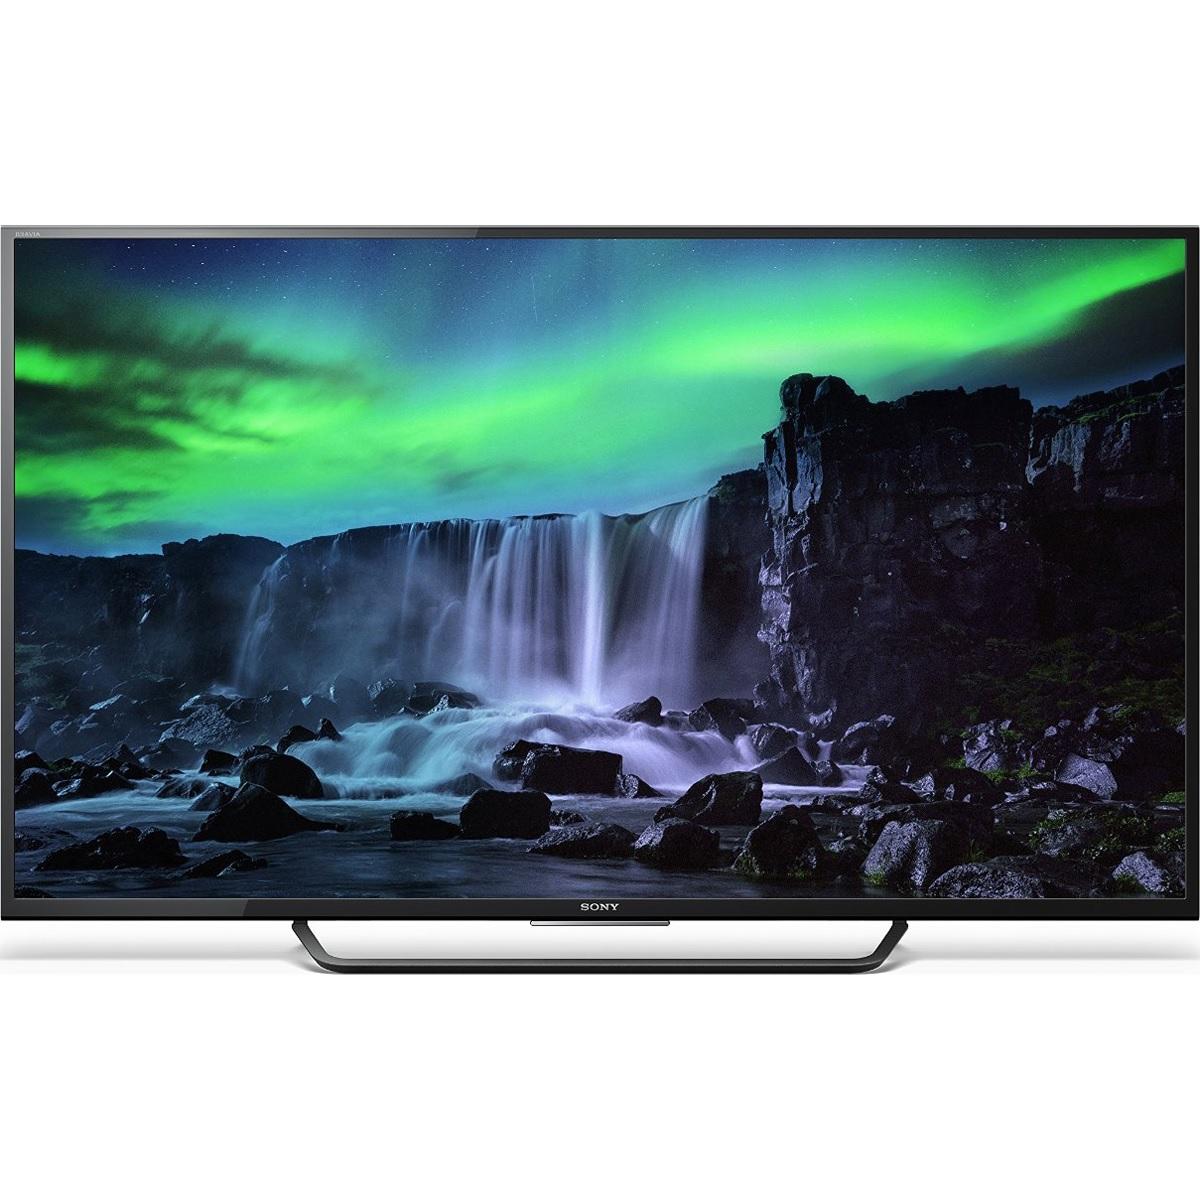 "65"" Sony XBR-65X810C 120Hz 4K Ultra HD Smart LED HDTV  $1200 + Free Shipping"